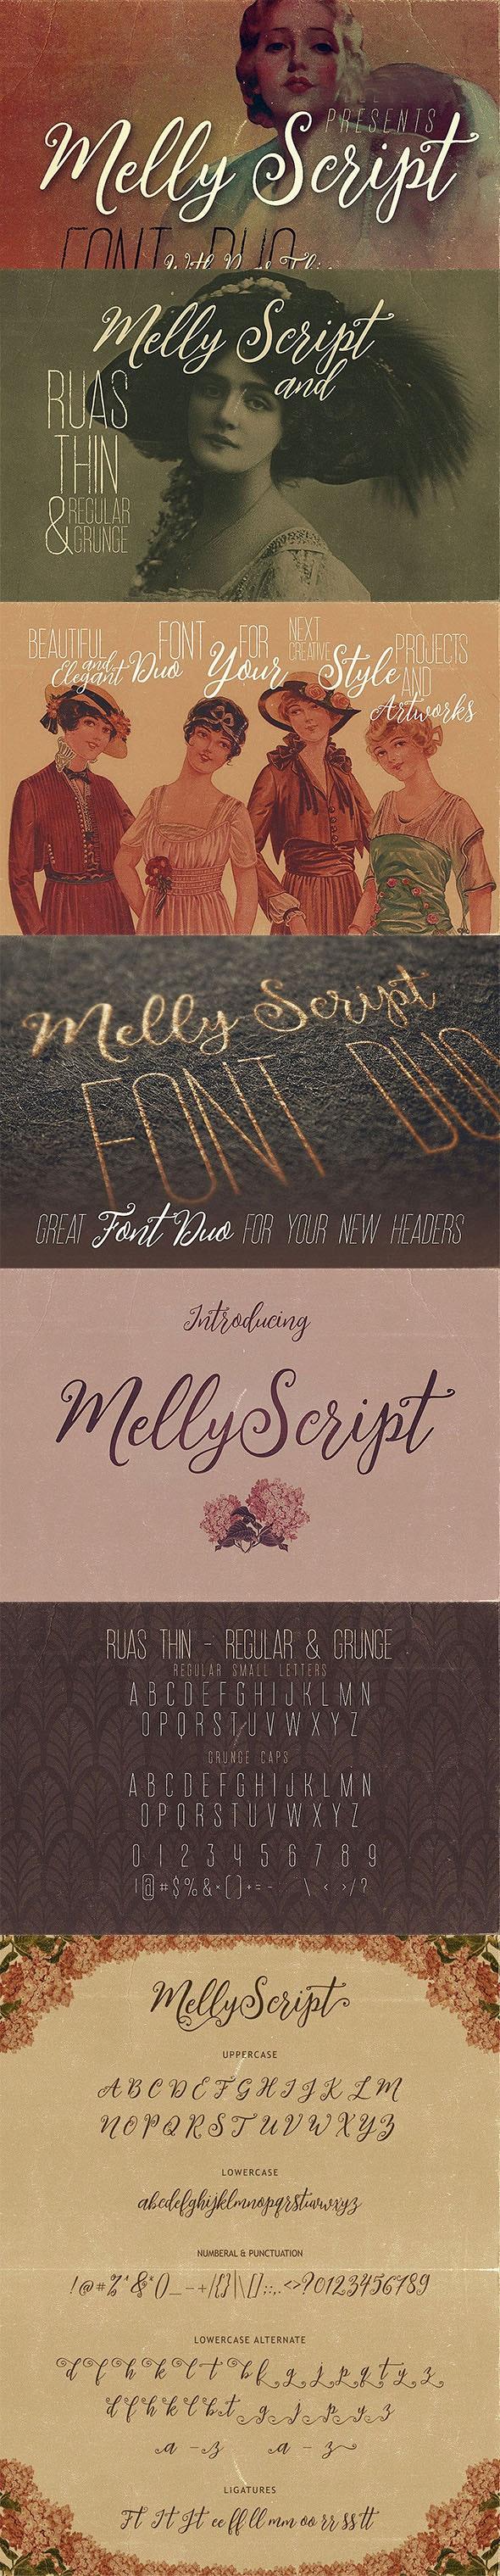 Melly Script Font Duo - Hand-writing Script